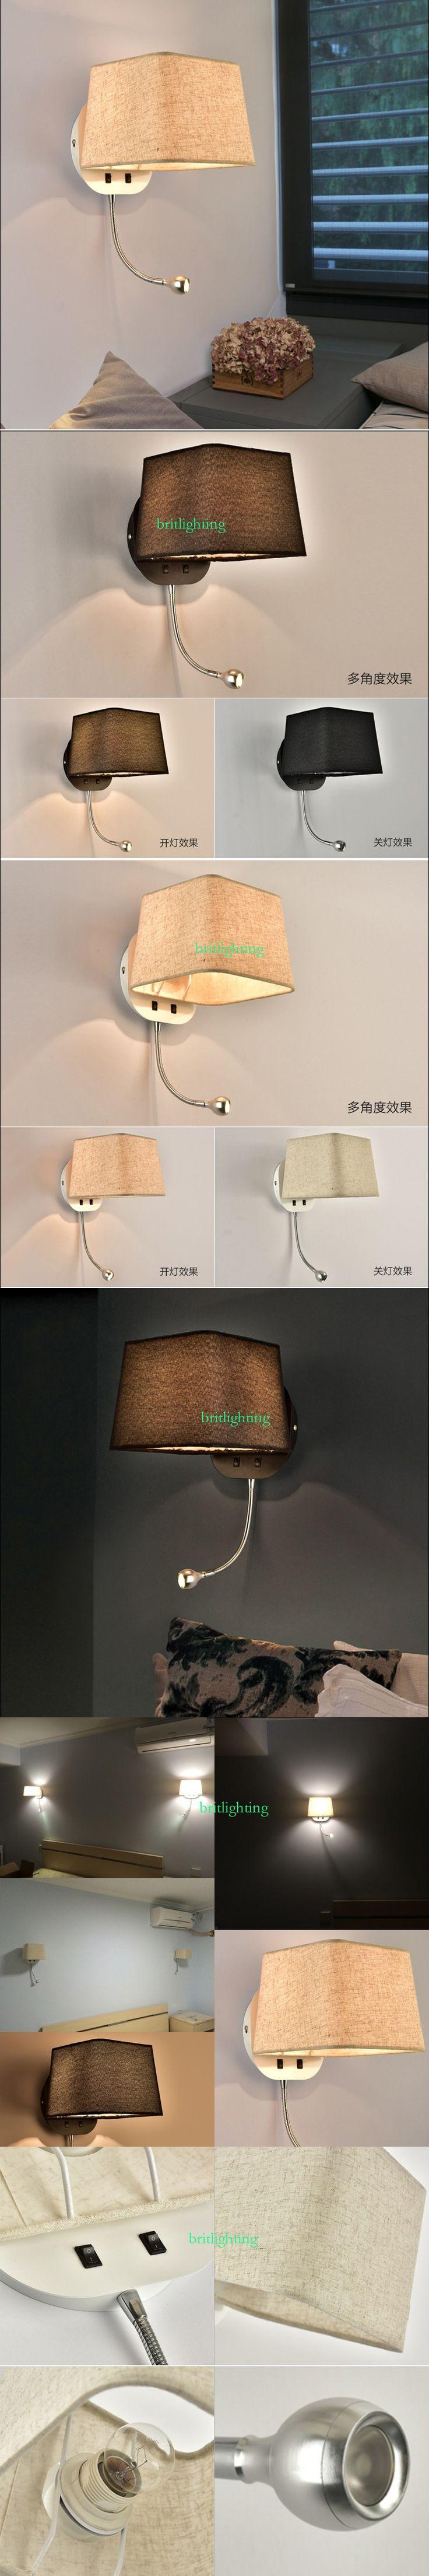 Foyer Indoor Lighting Wall Sconce Wall Mounted Light Bedroom Reading Lights  Adjustable Home Decoration Corridor Lamp Industrial